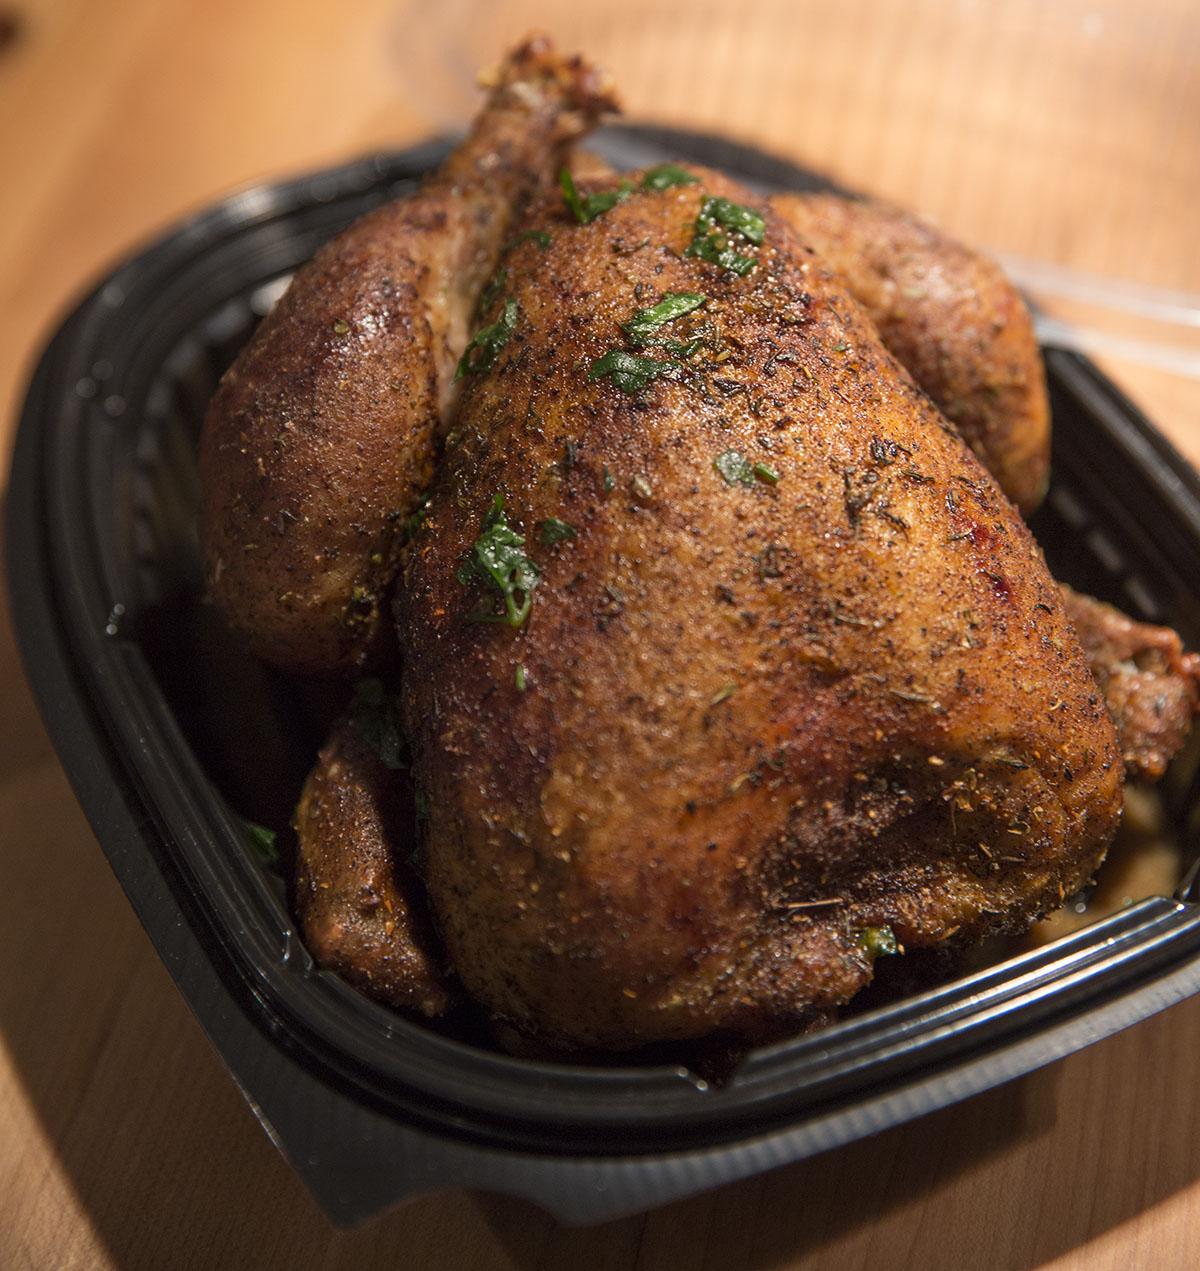 Rotisserie chicken to go from Branch Line